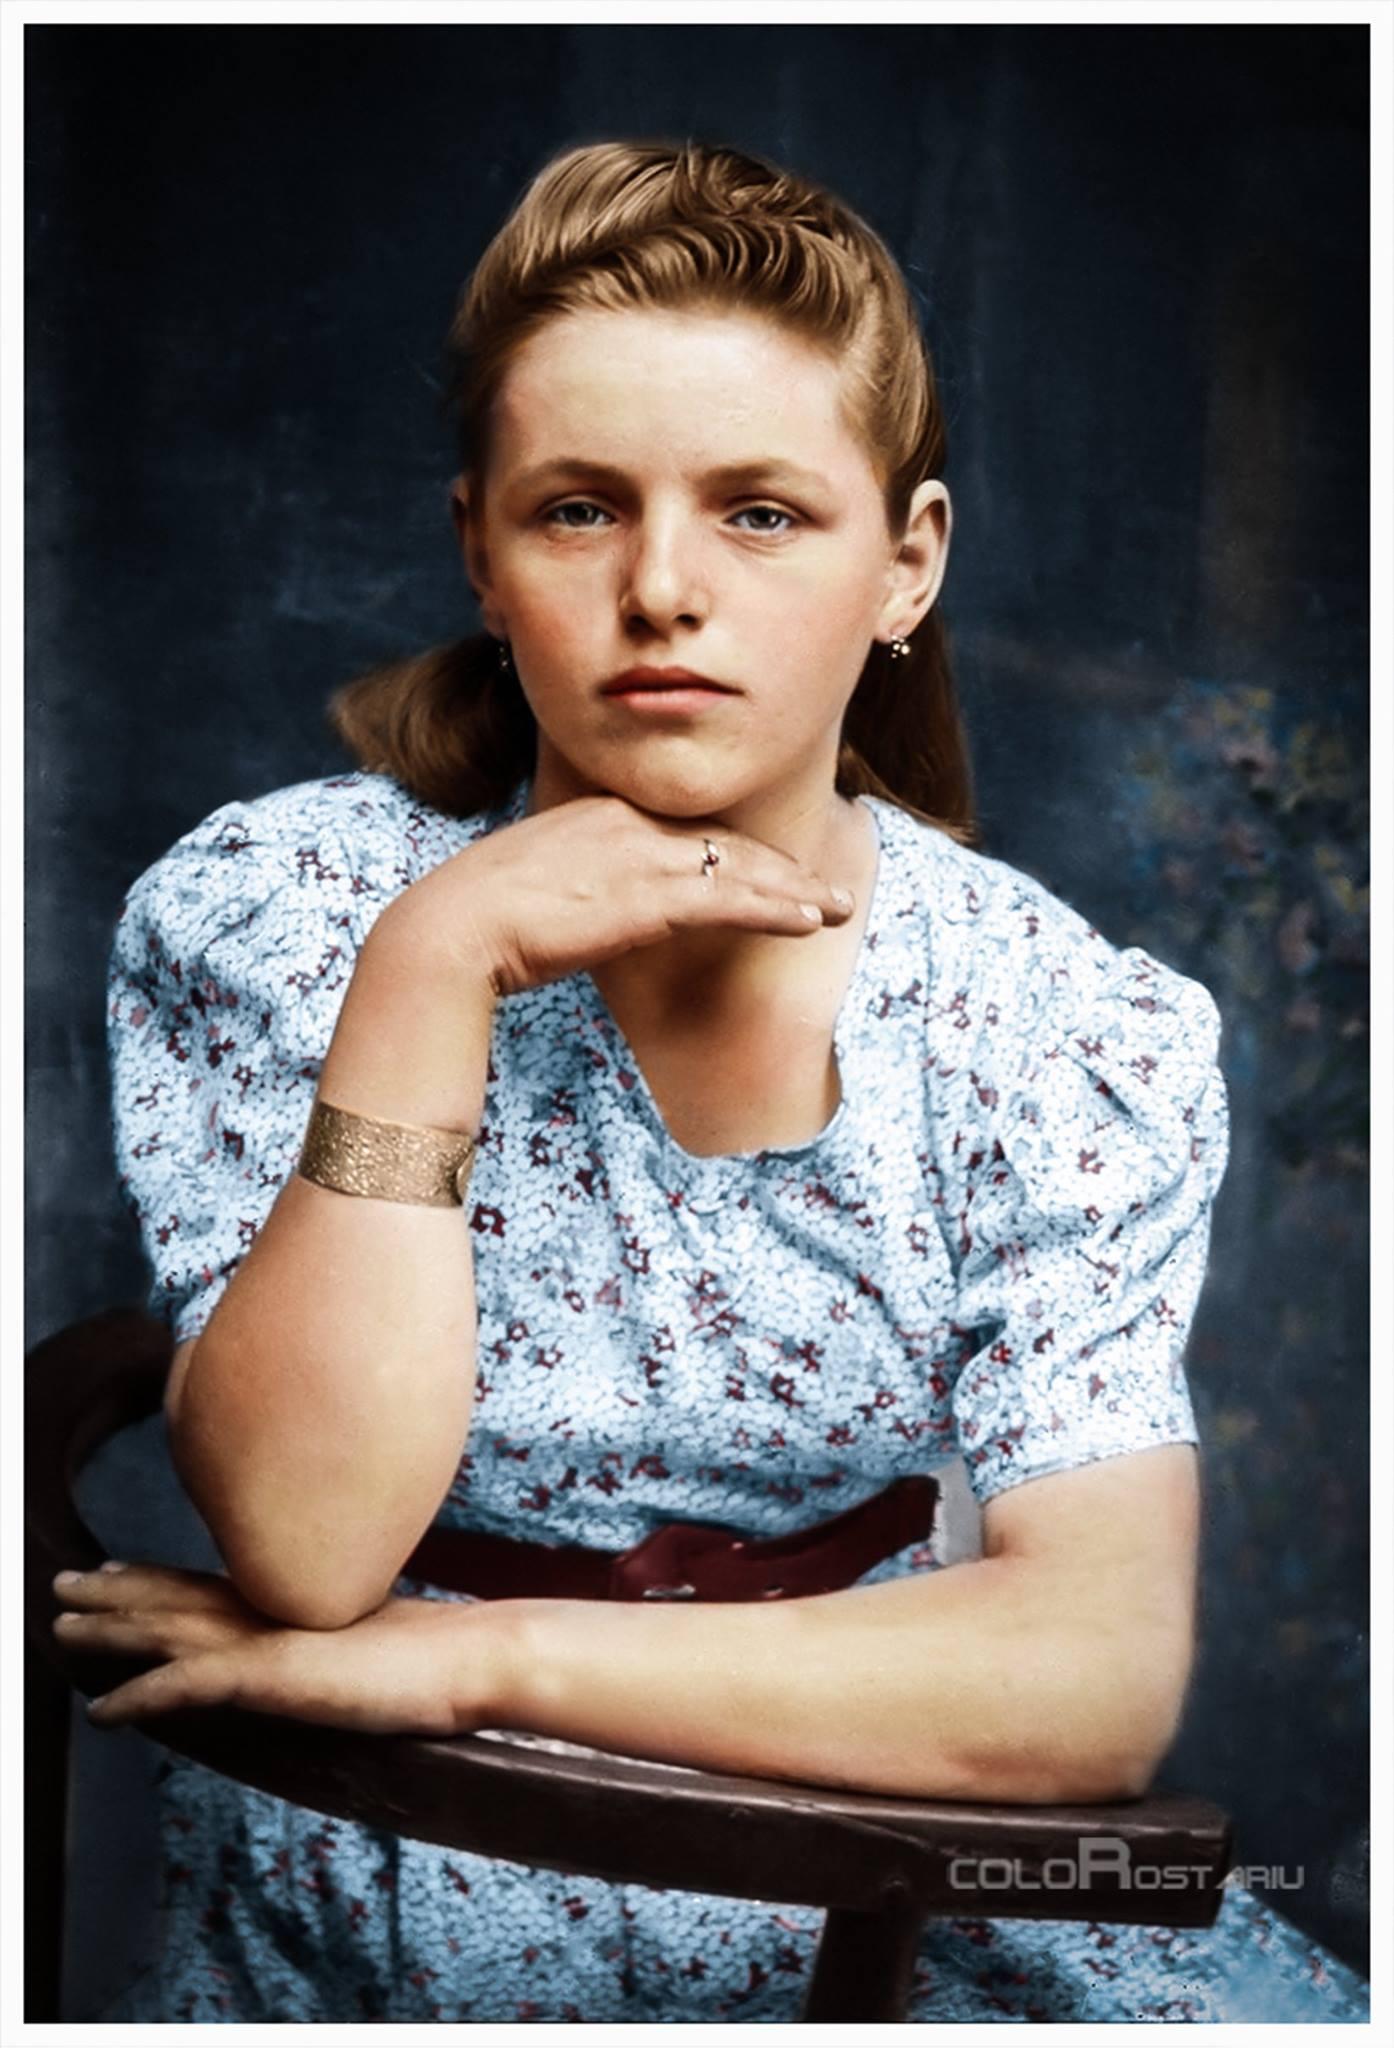 a-beautiful-romanian-girl-of-the-1940-s-fashion-romania-colored-photo-costica-acsinte-photo-colections-bucharest-bucuresti-slobozia.jpg